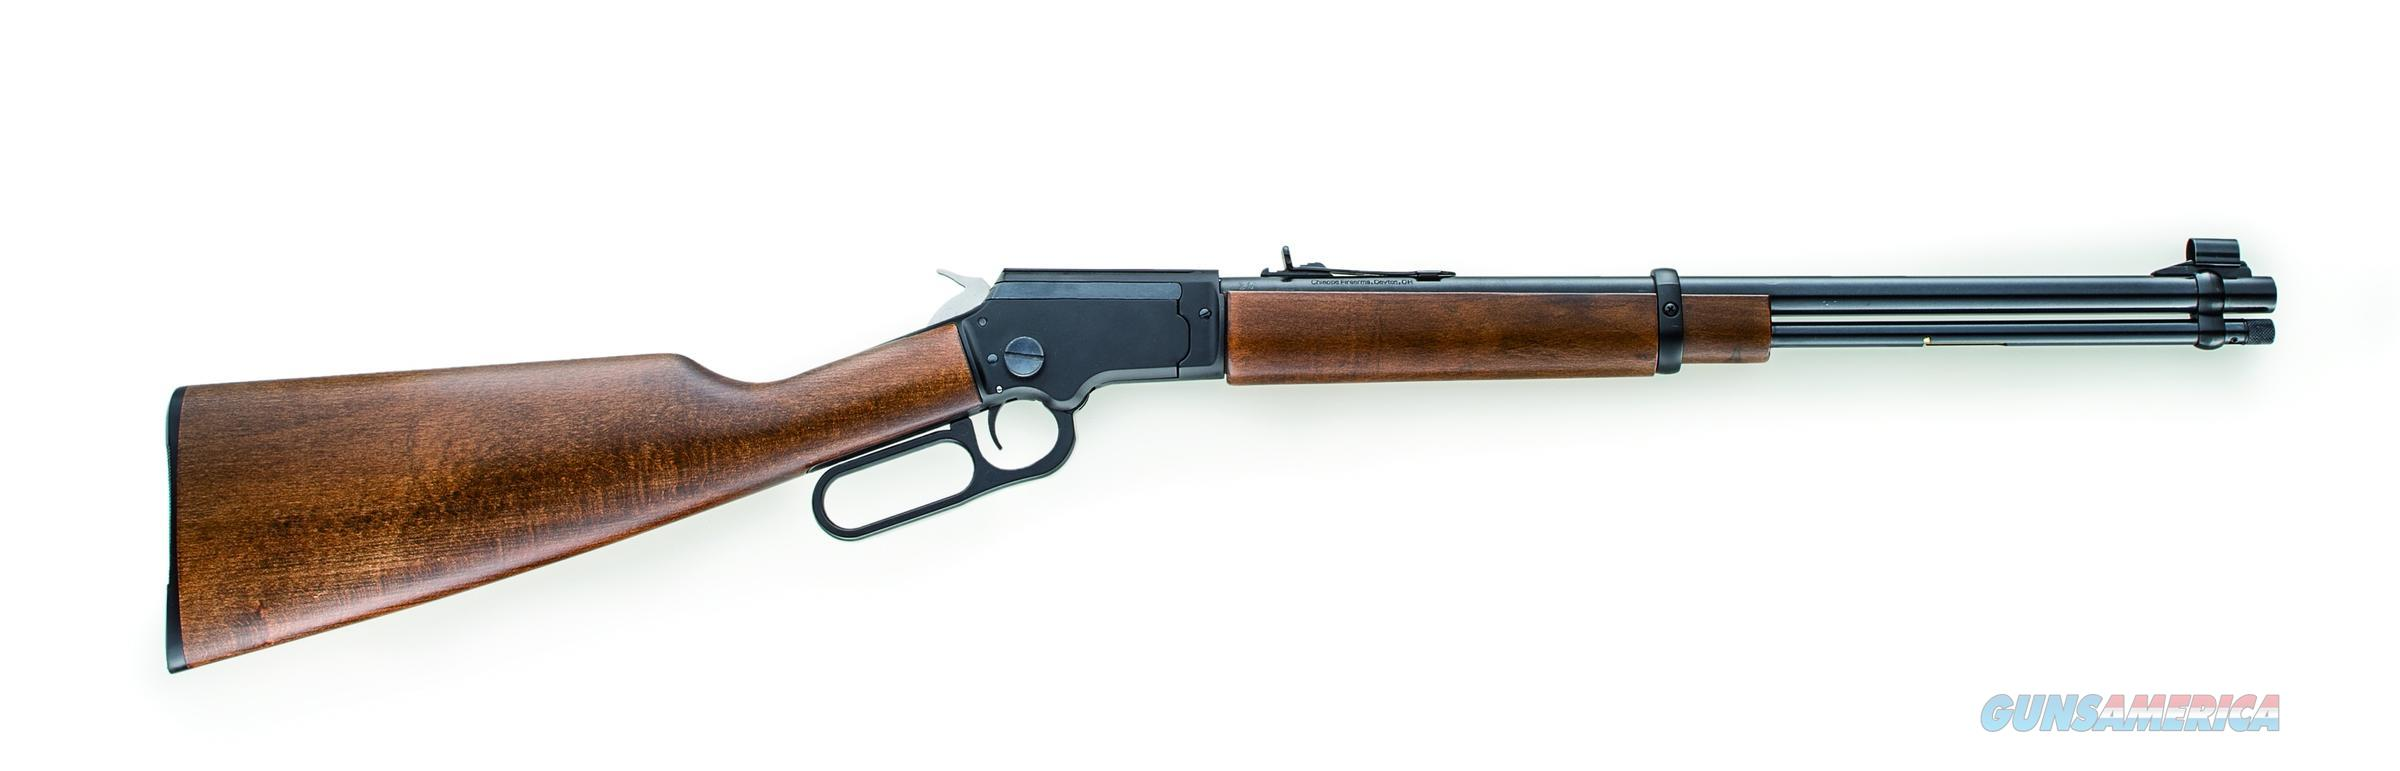 Chiappa LA322 Standard Carbine Take Down .22 LR 920.383   Guns > Rifles > Chiappa / Armi Sport Rifles > .22 Cal Rifles